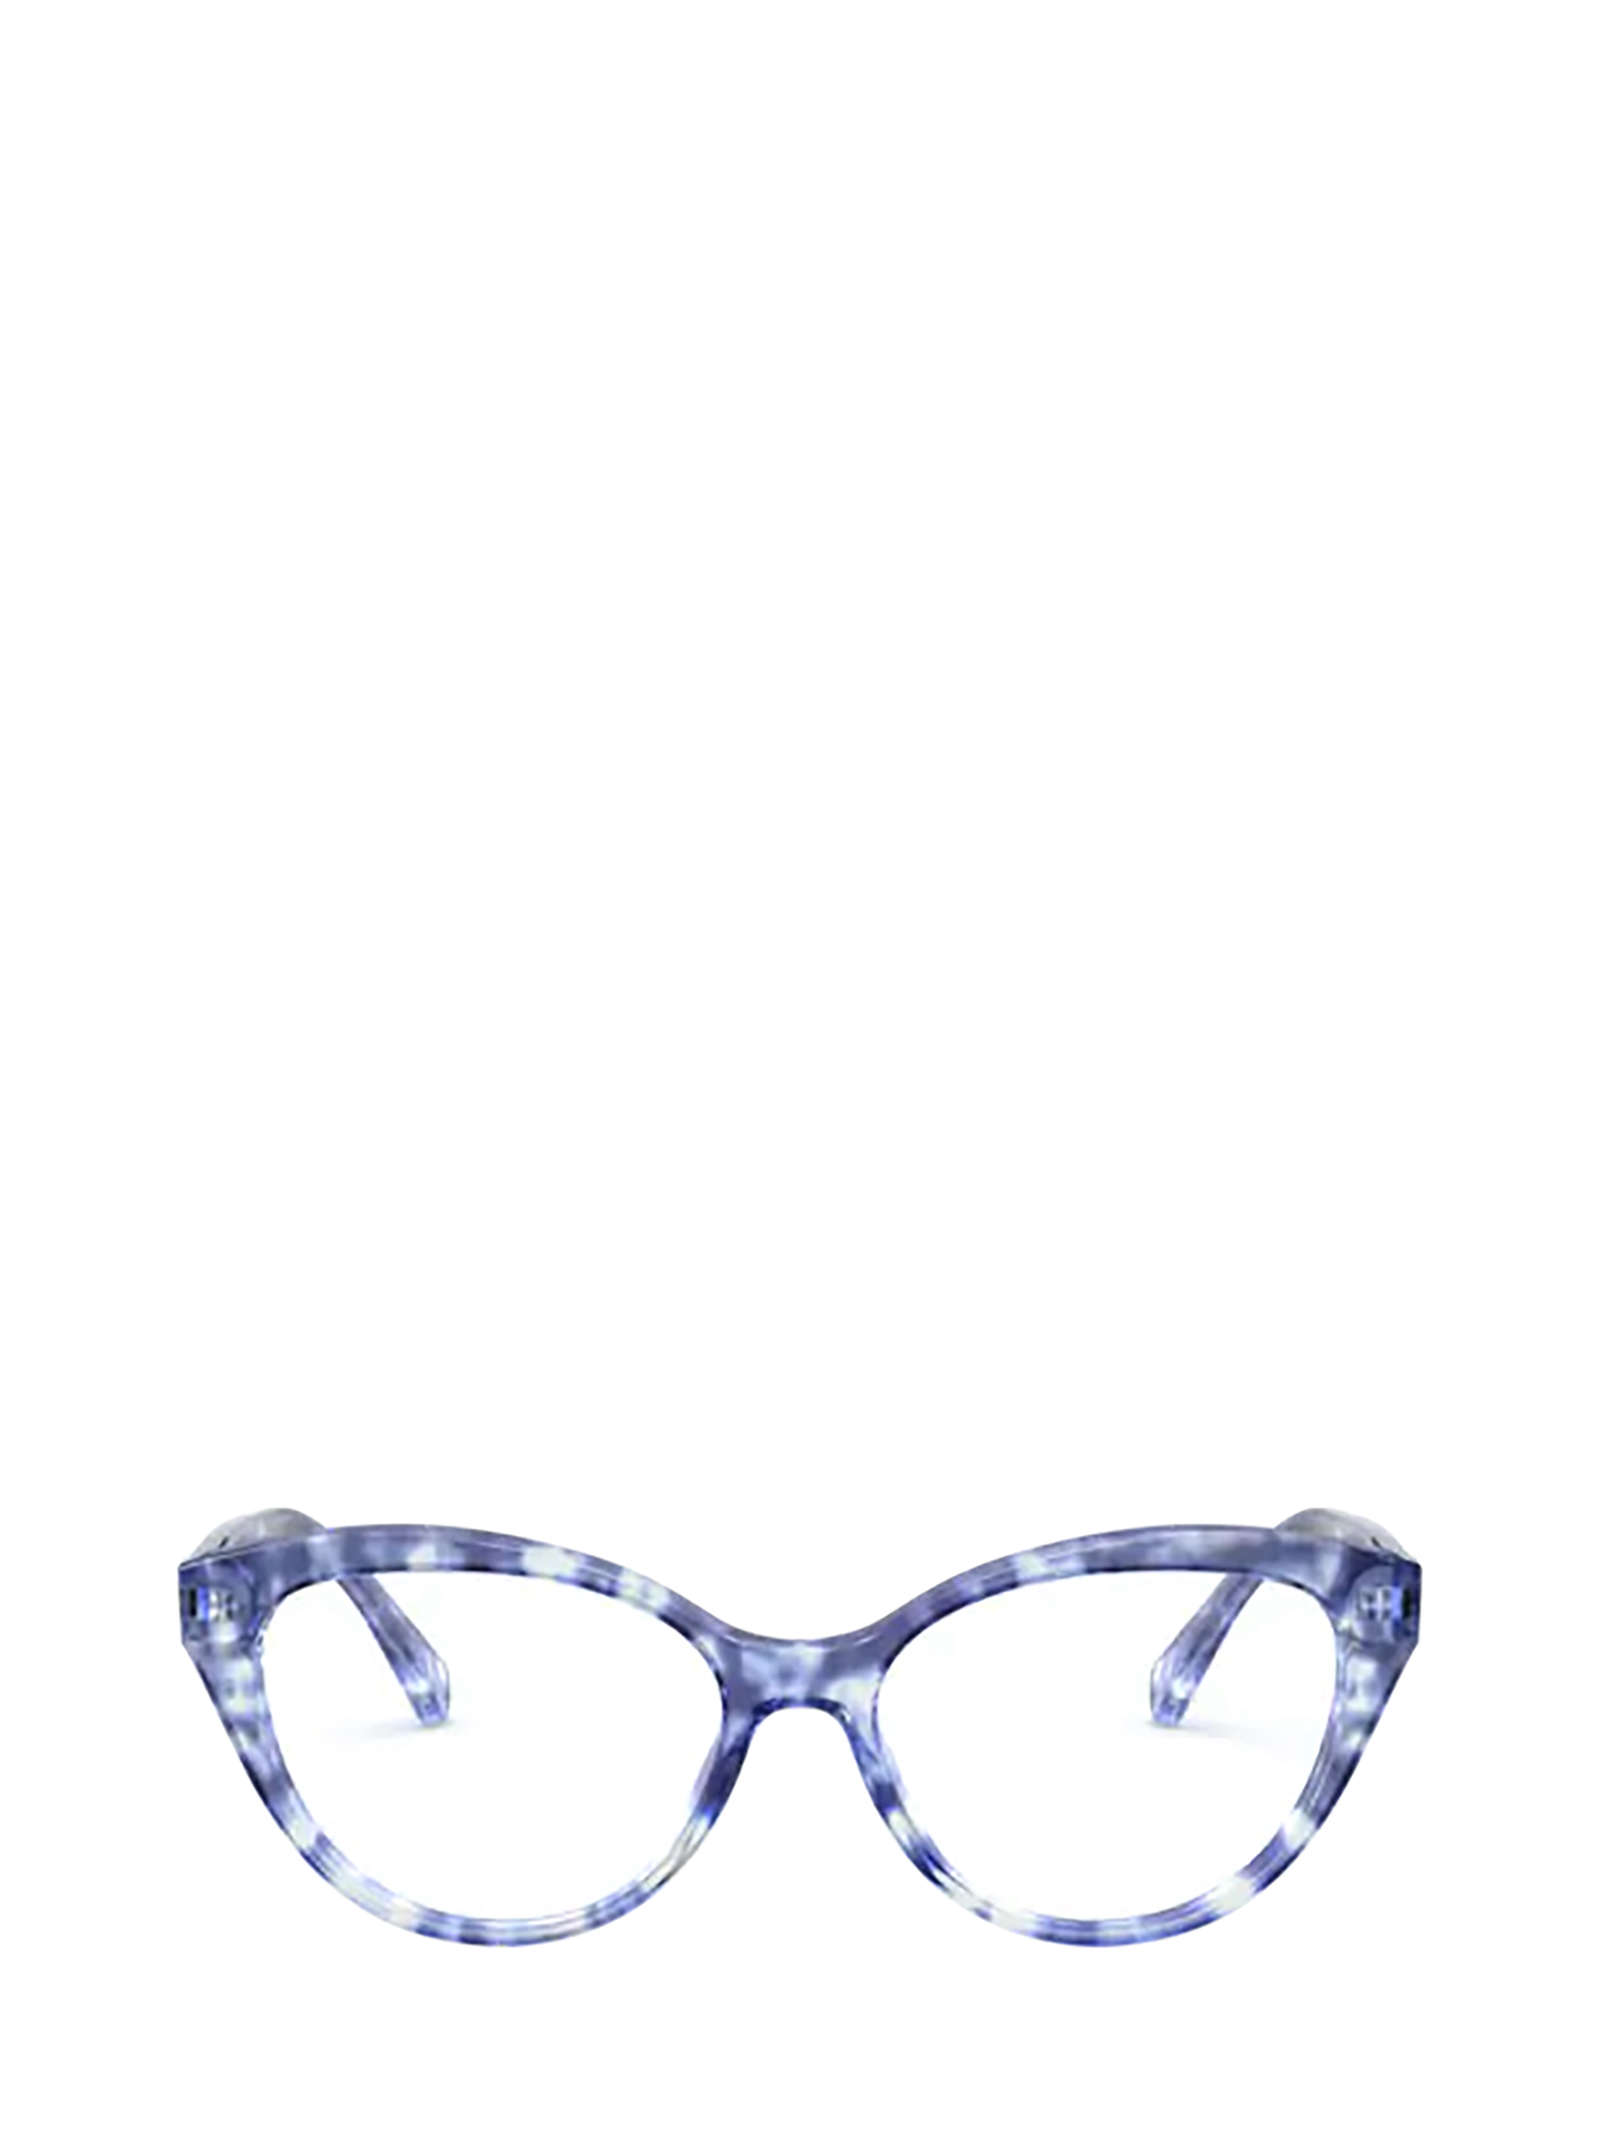 Polo Ralph Lauren Ralph Ra7116 Spotted Havana Violet / Blue Glasses